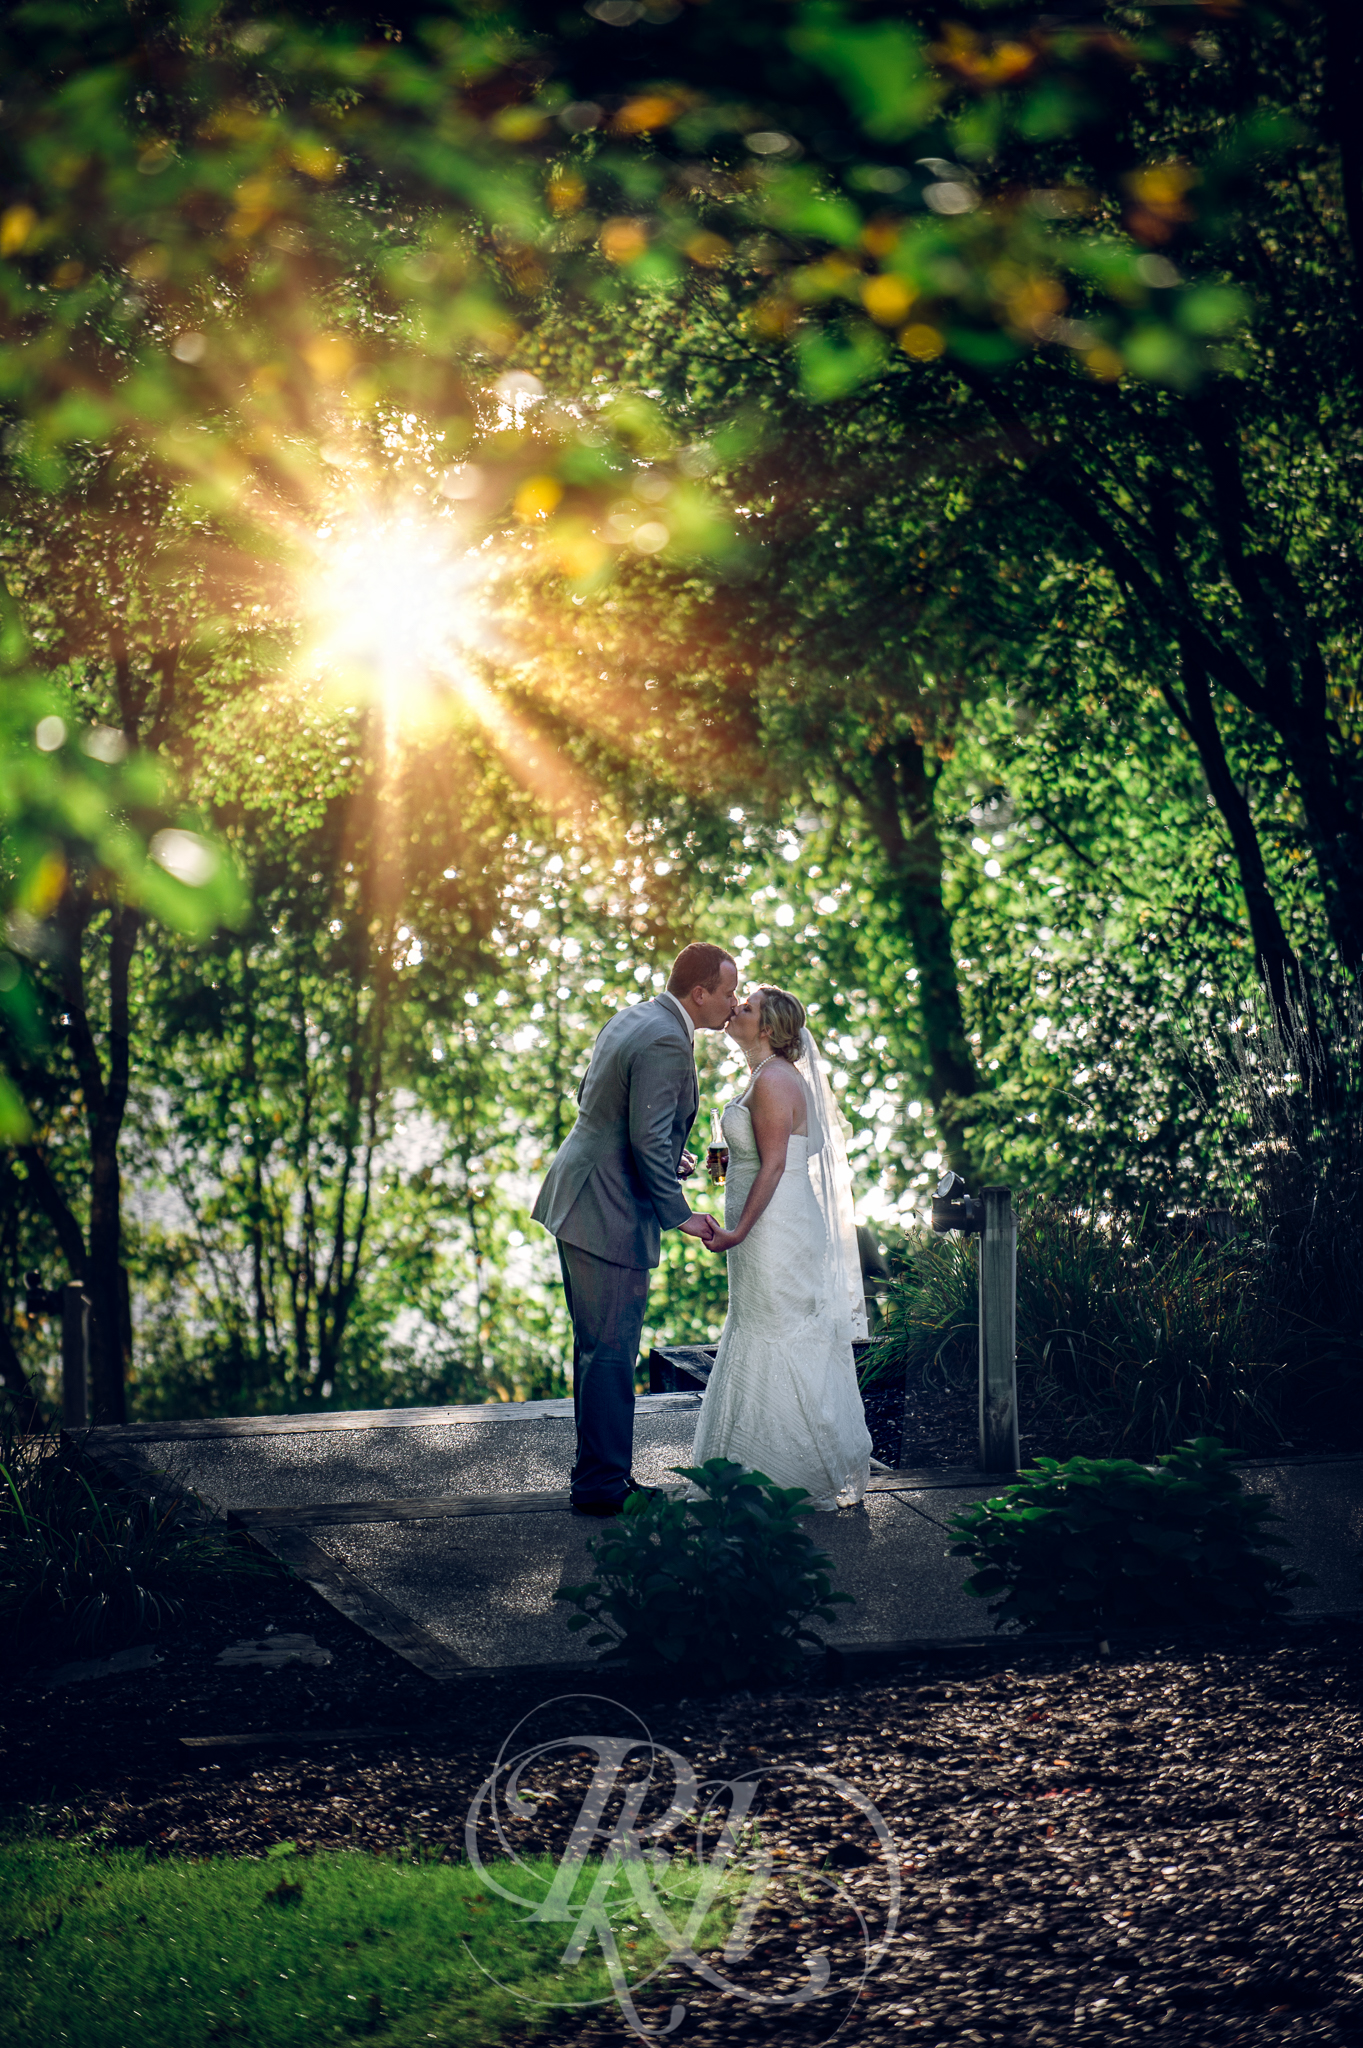 Jackie & Corey - Minnesota Wedding Photography - RKH Images -18.jpg